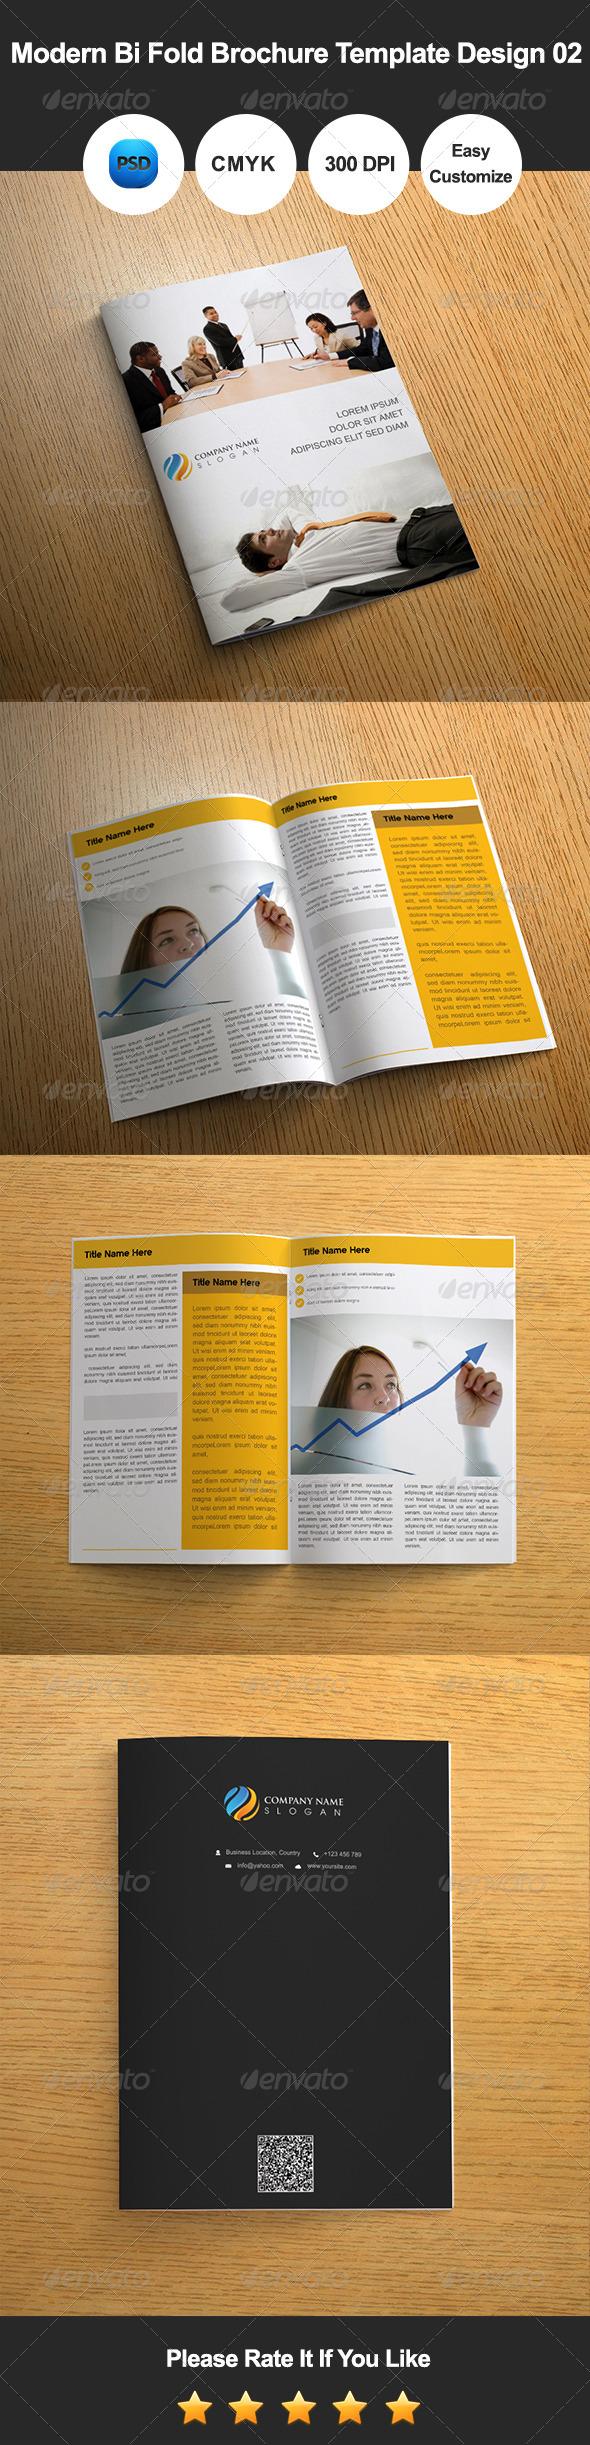 GraphicRiver Modern Bi Fold Brochure Template Design 02 7367114